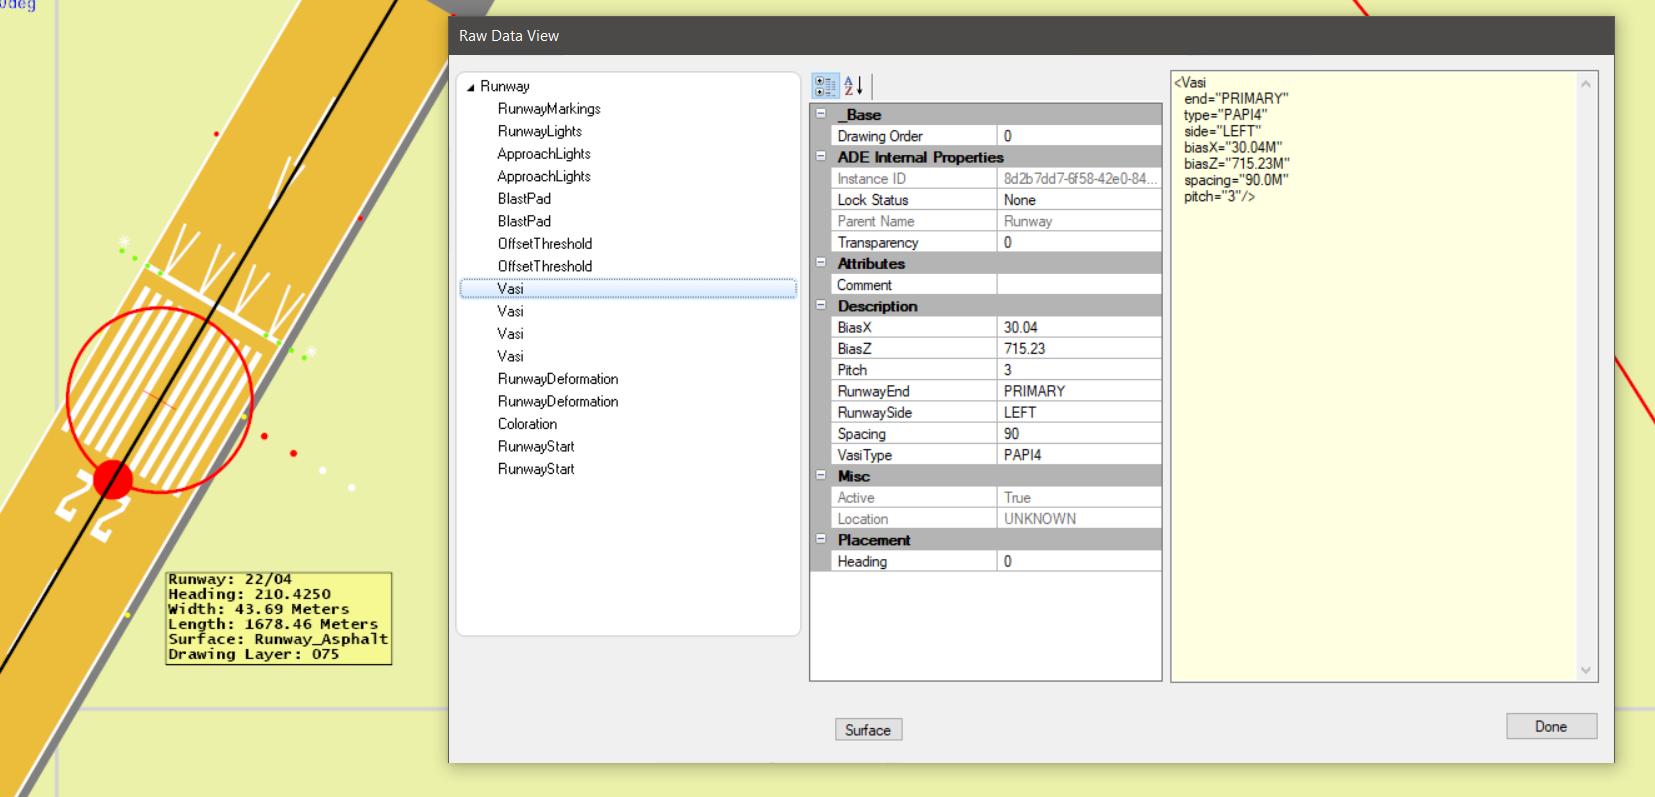 Screenshot 2021-05-09 104843.png